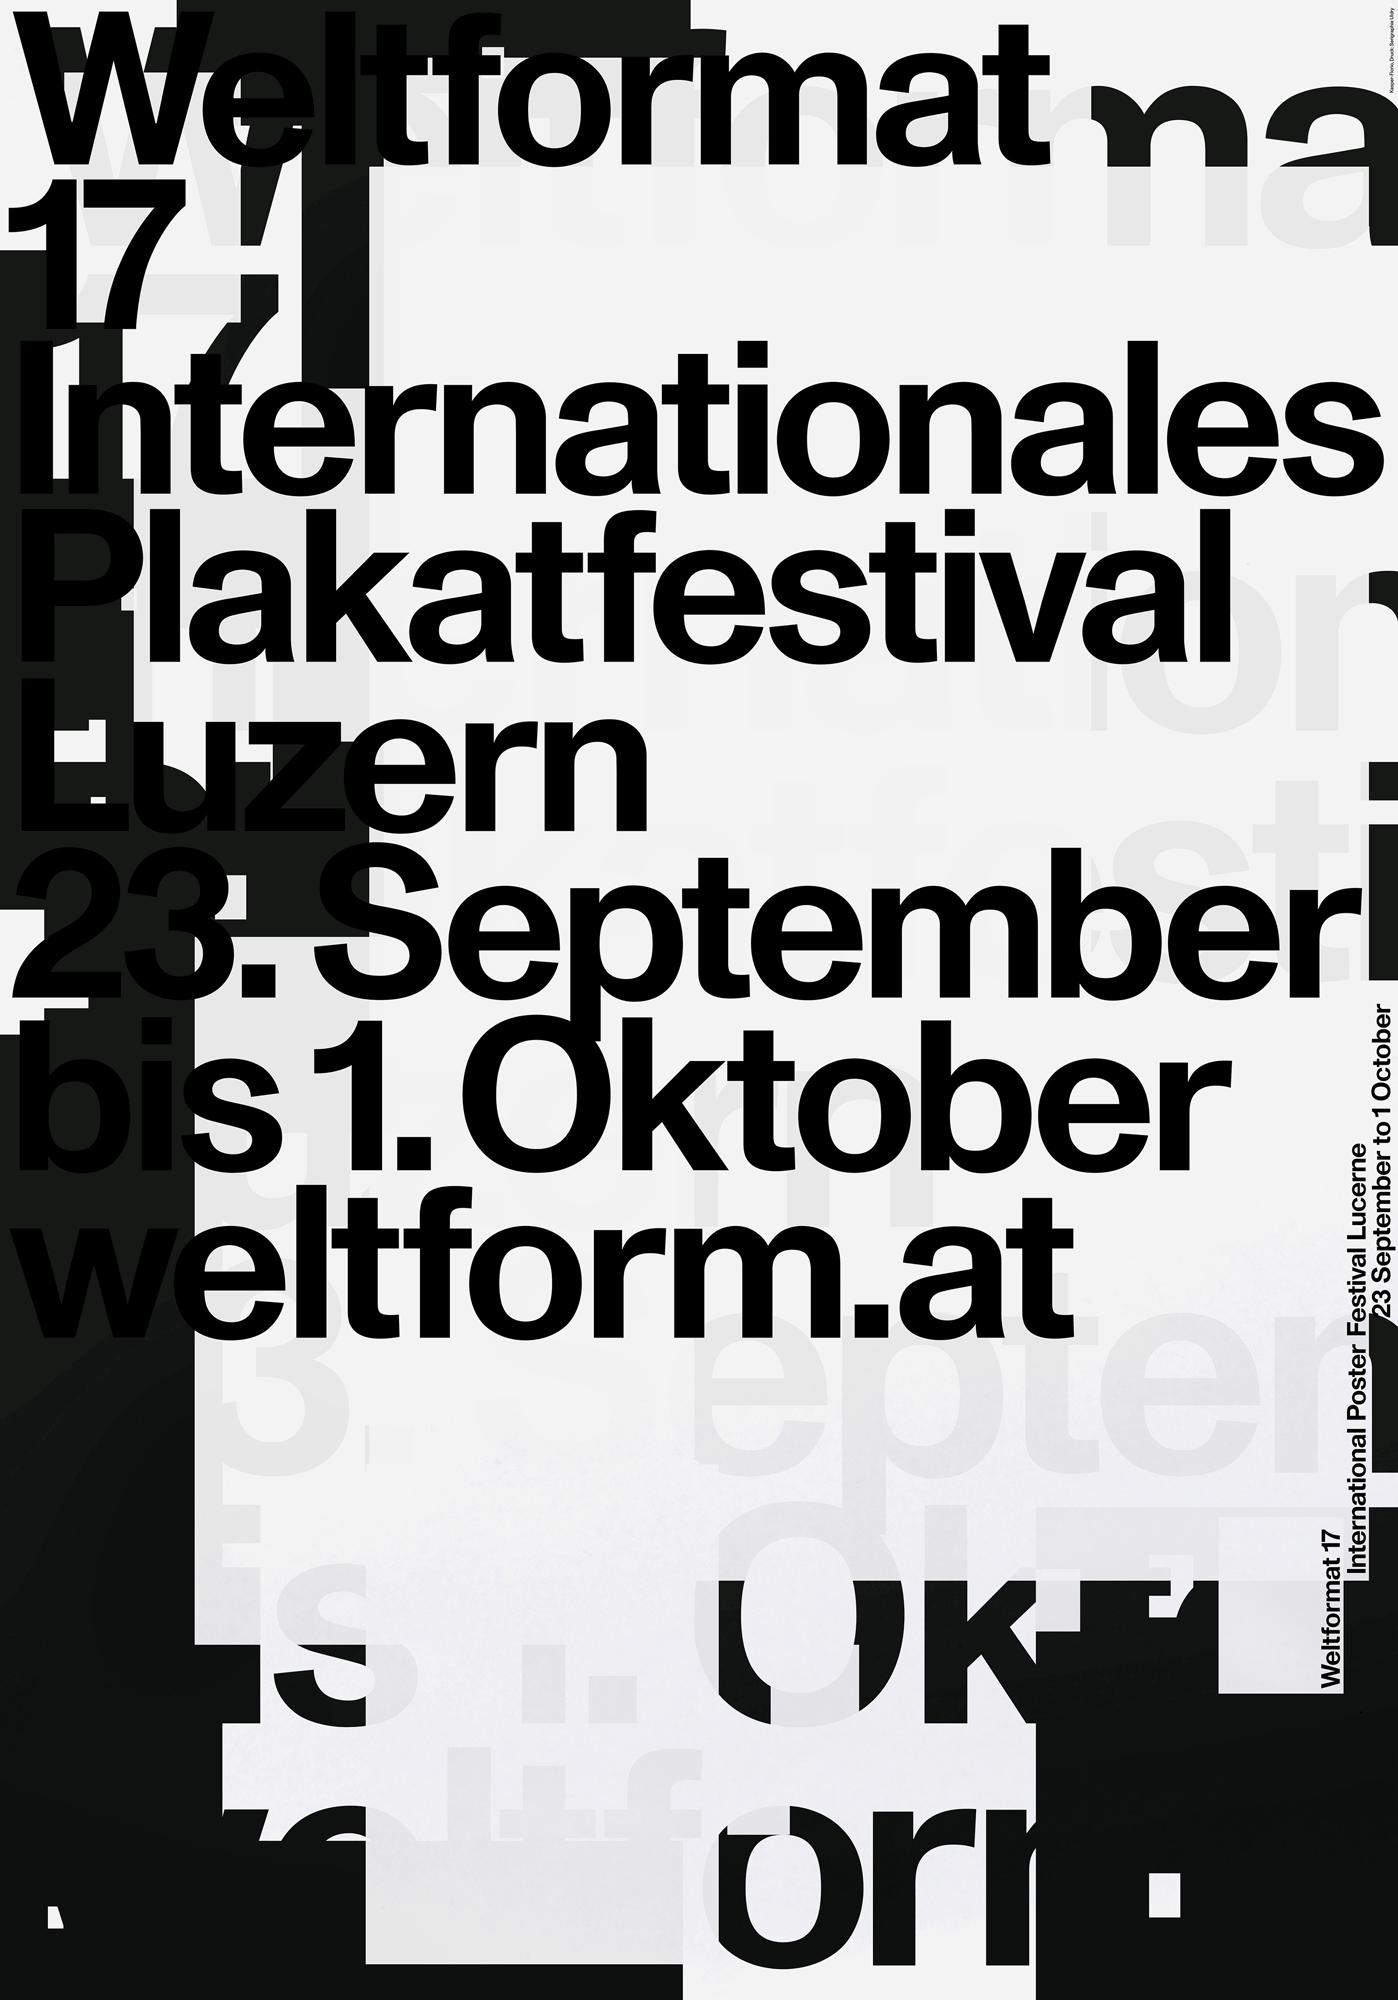 Welformat Plakatfestival